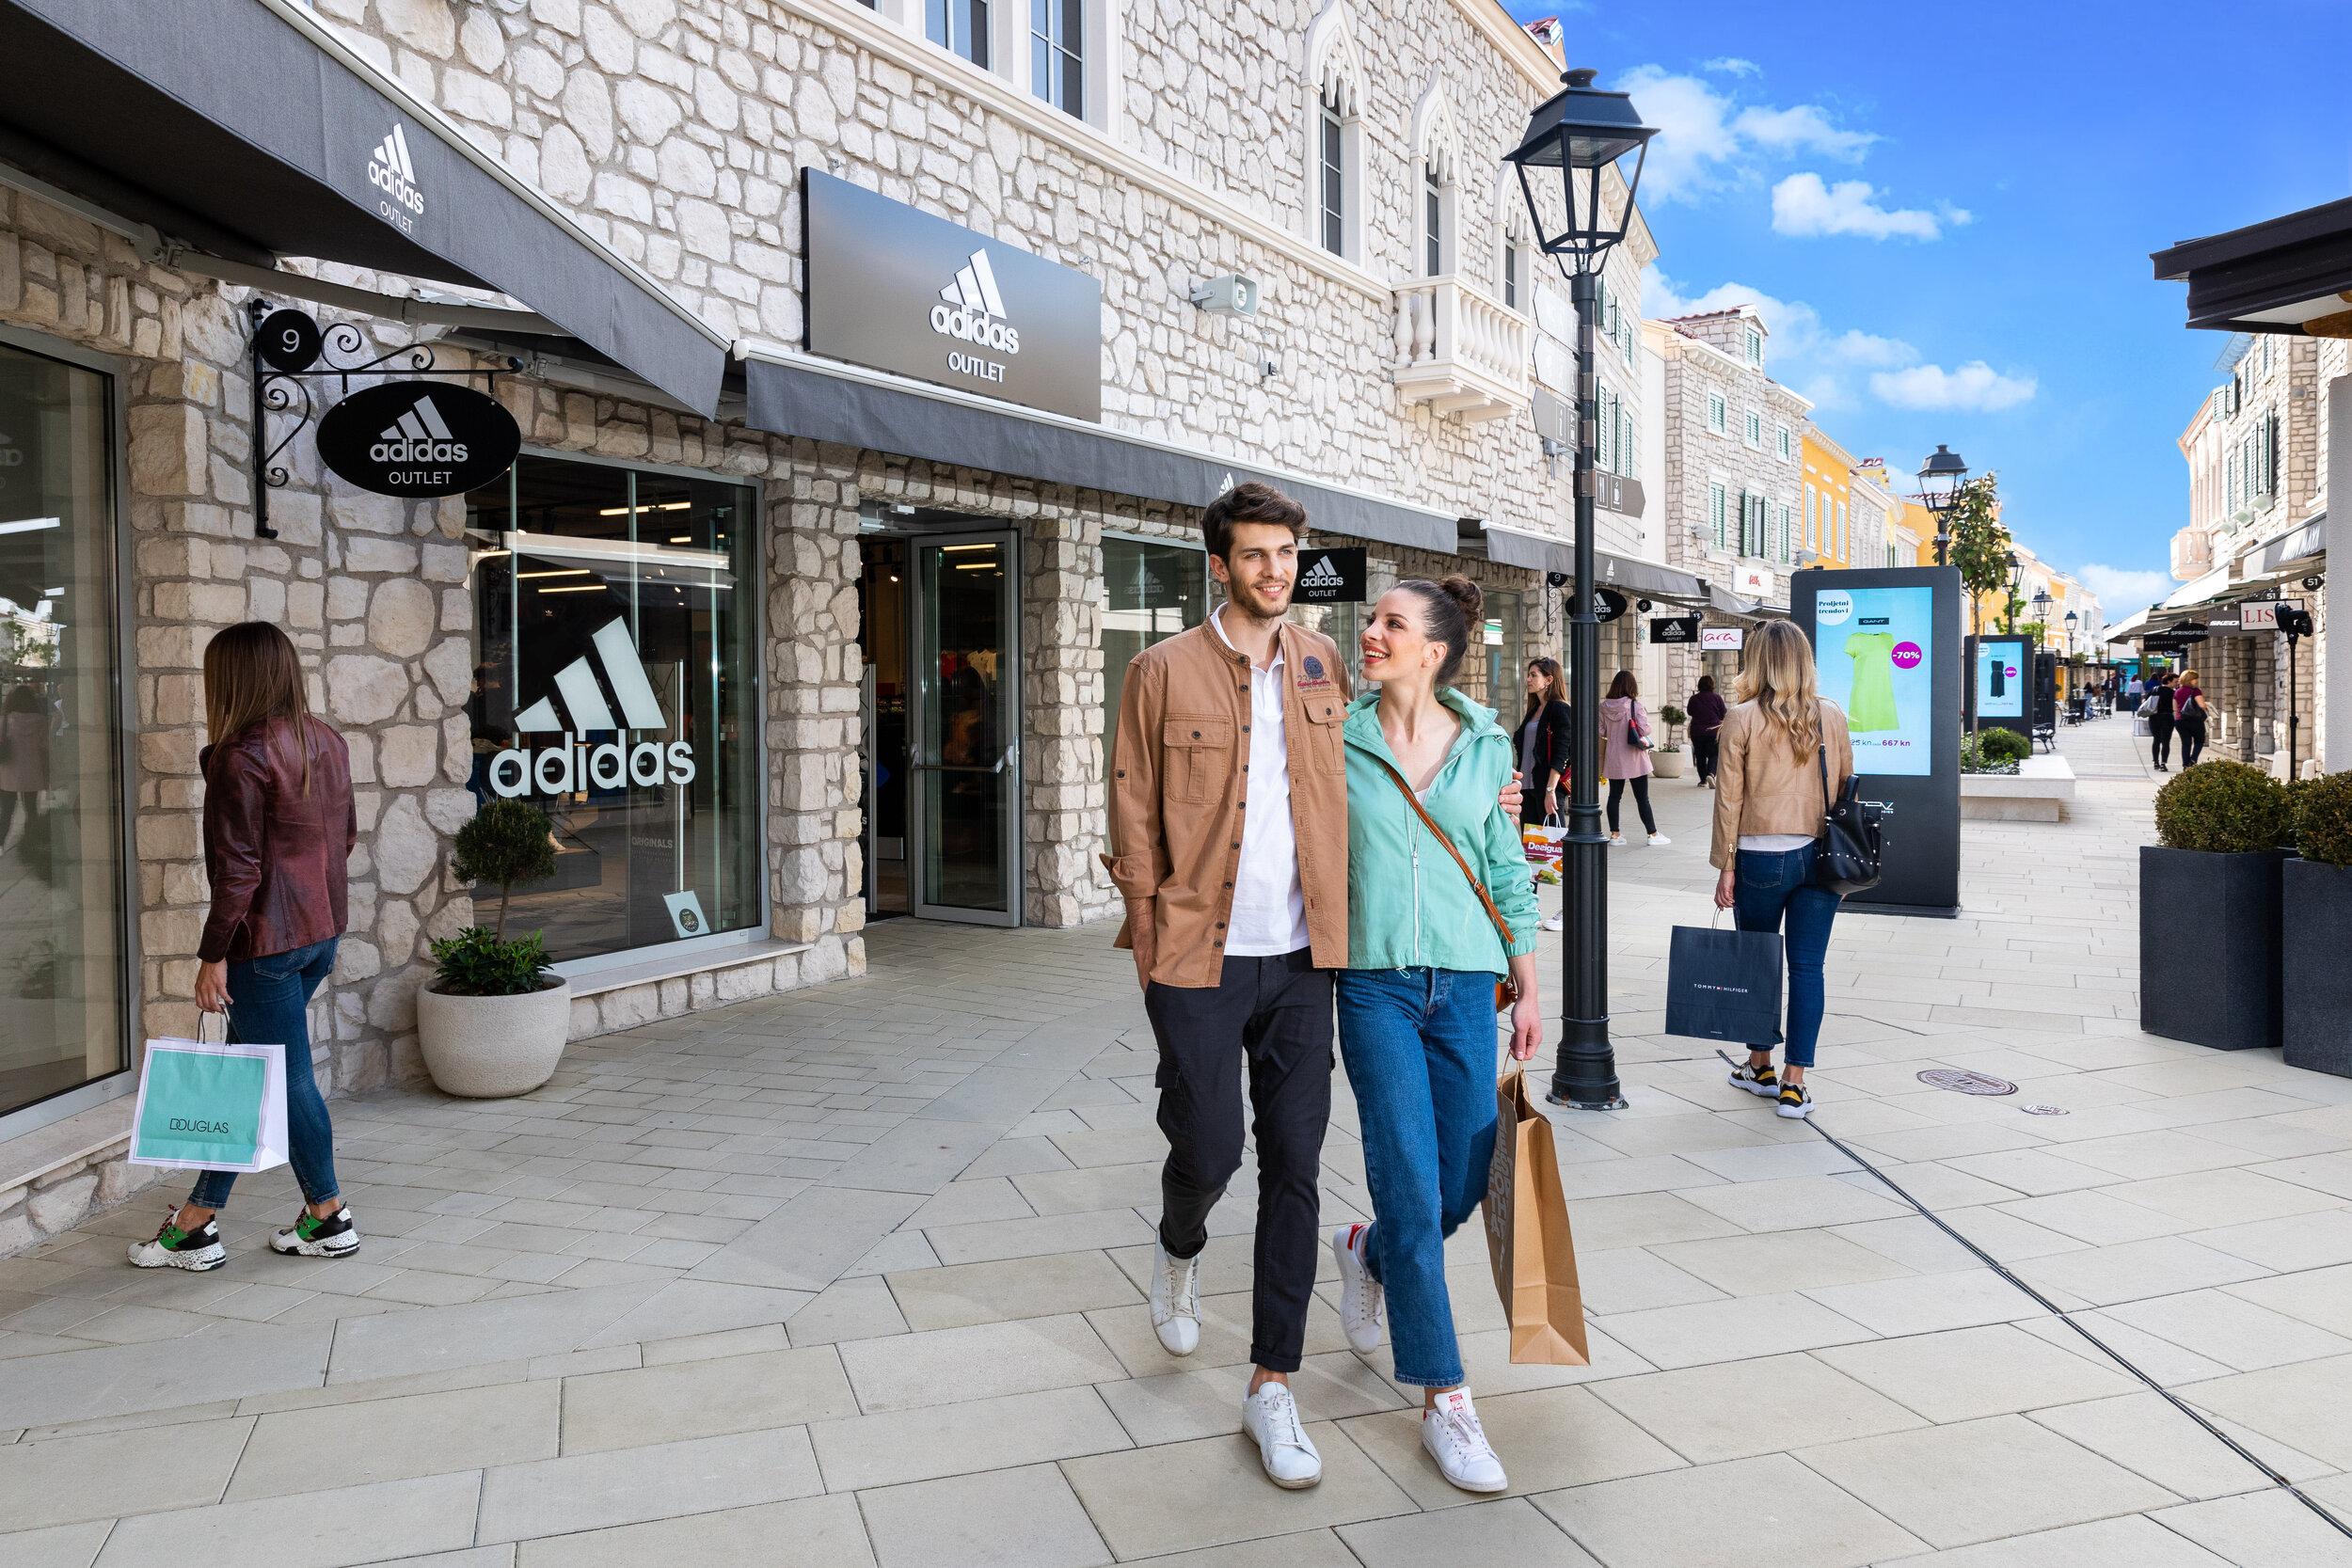 Designer Outlet Croatia — ROS Retail Outlet Shopping